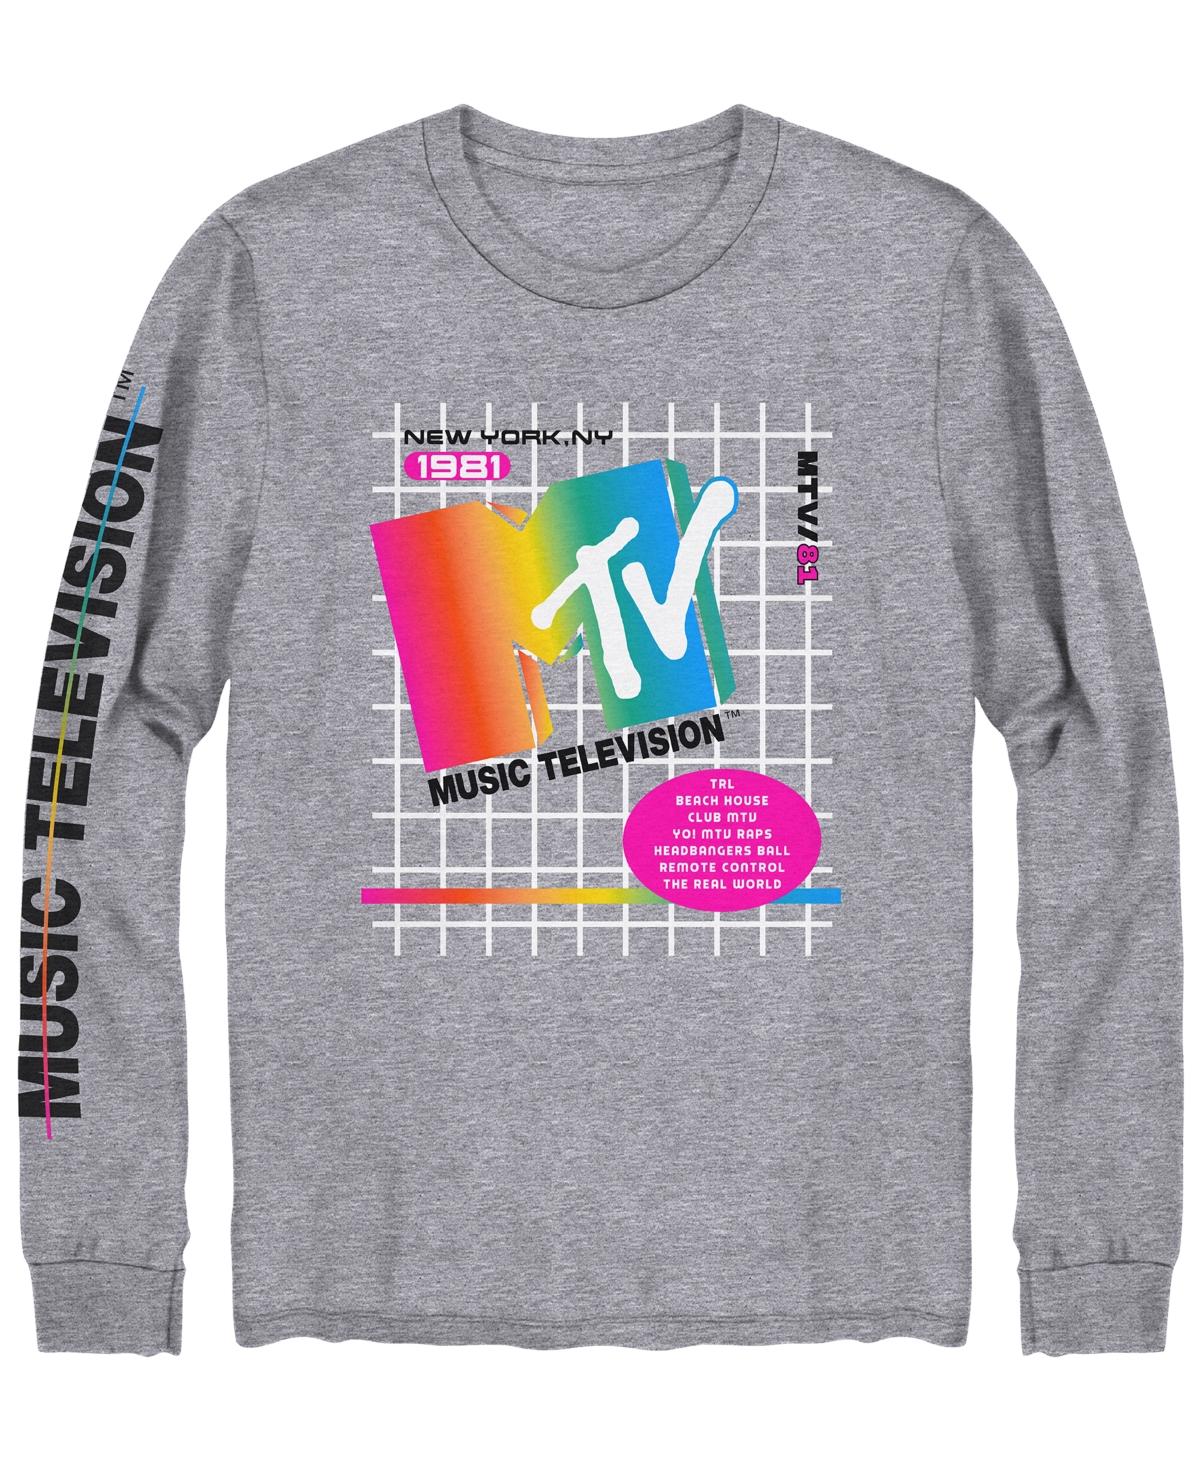 Men's 1981 Mtv Long-Sleeve Graphic T-Shirt